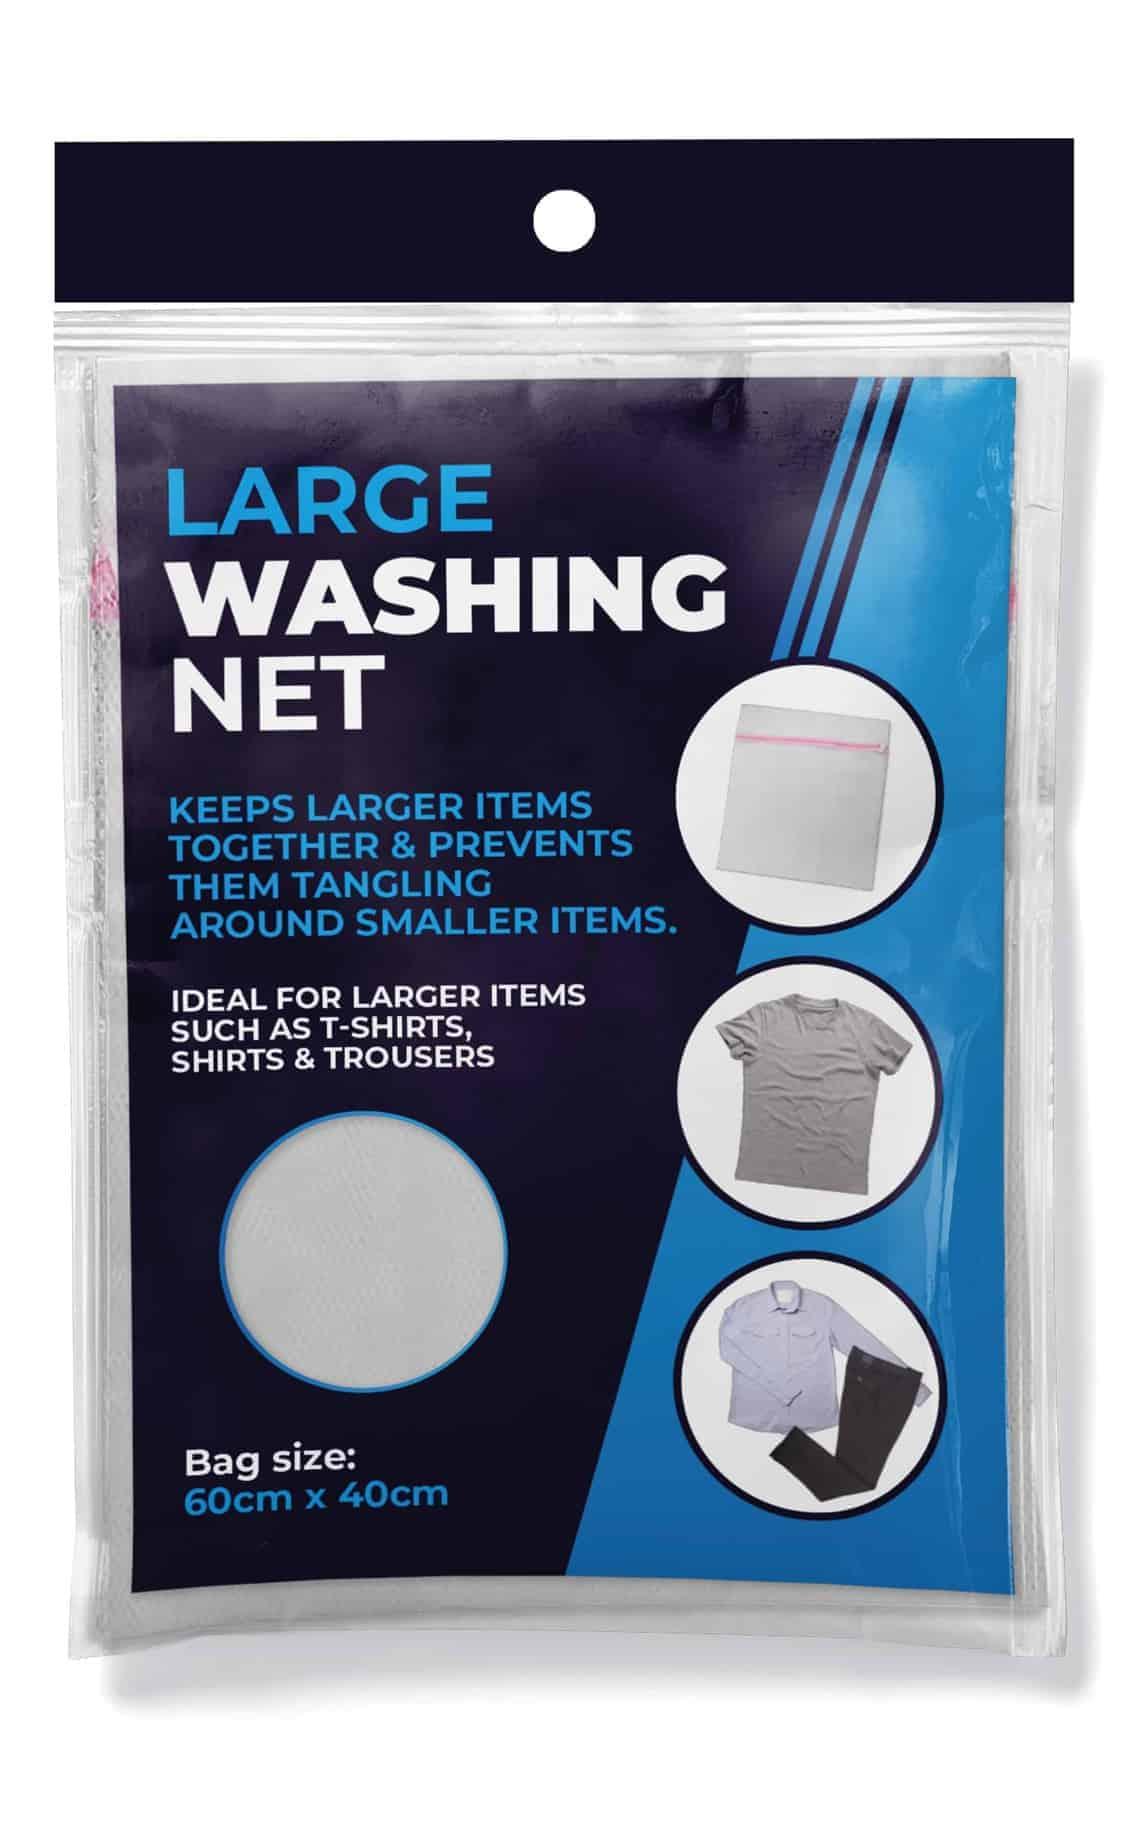 151 Products Washing Bag 60Cm X 40Cm